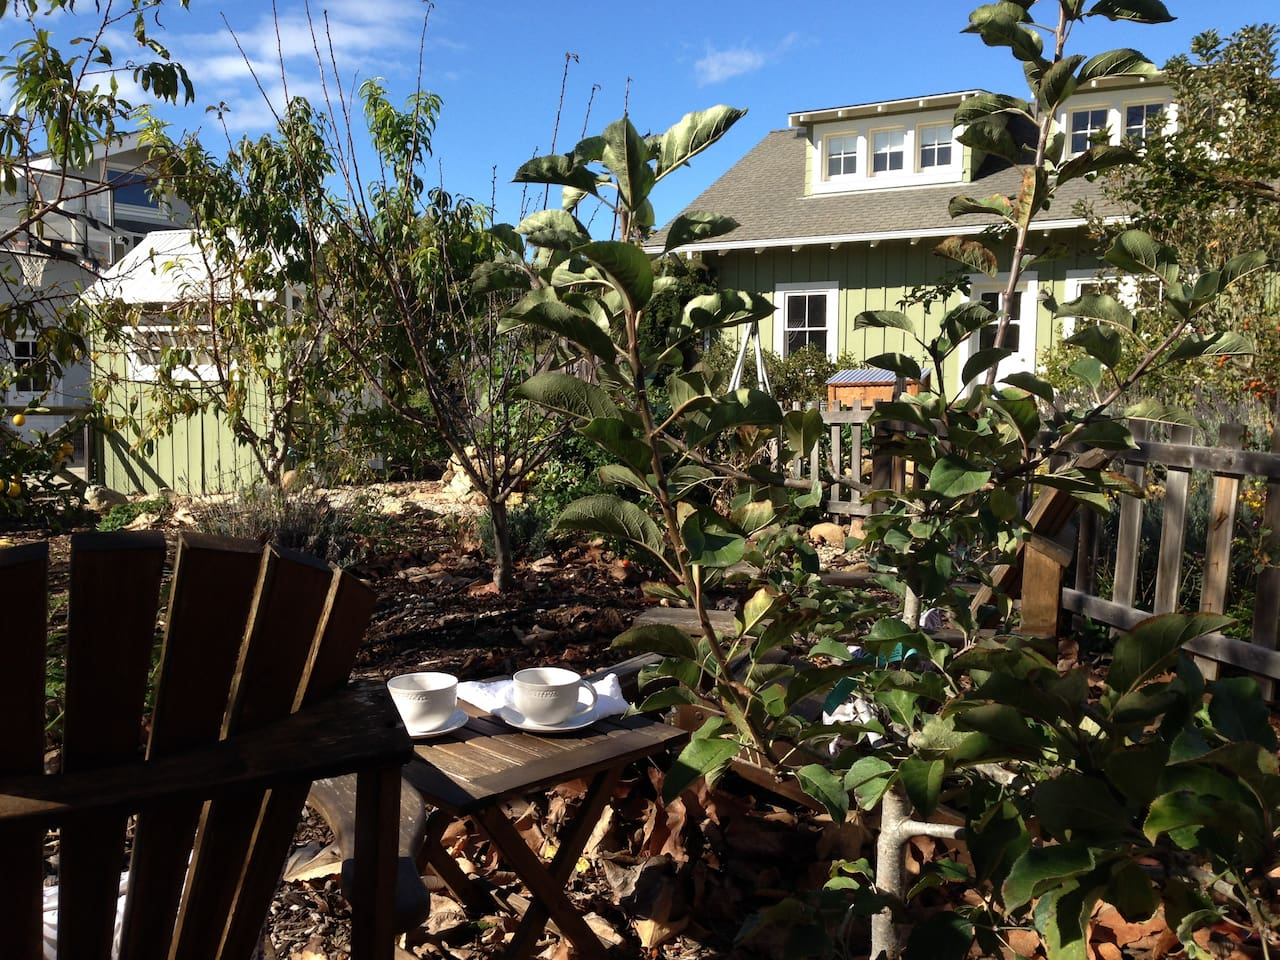 Garden Loft Apartment Near Beach - Houses for Rent in Santa Barbara ...